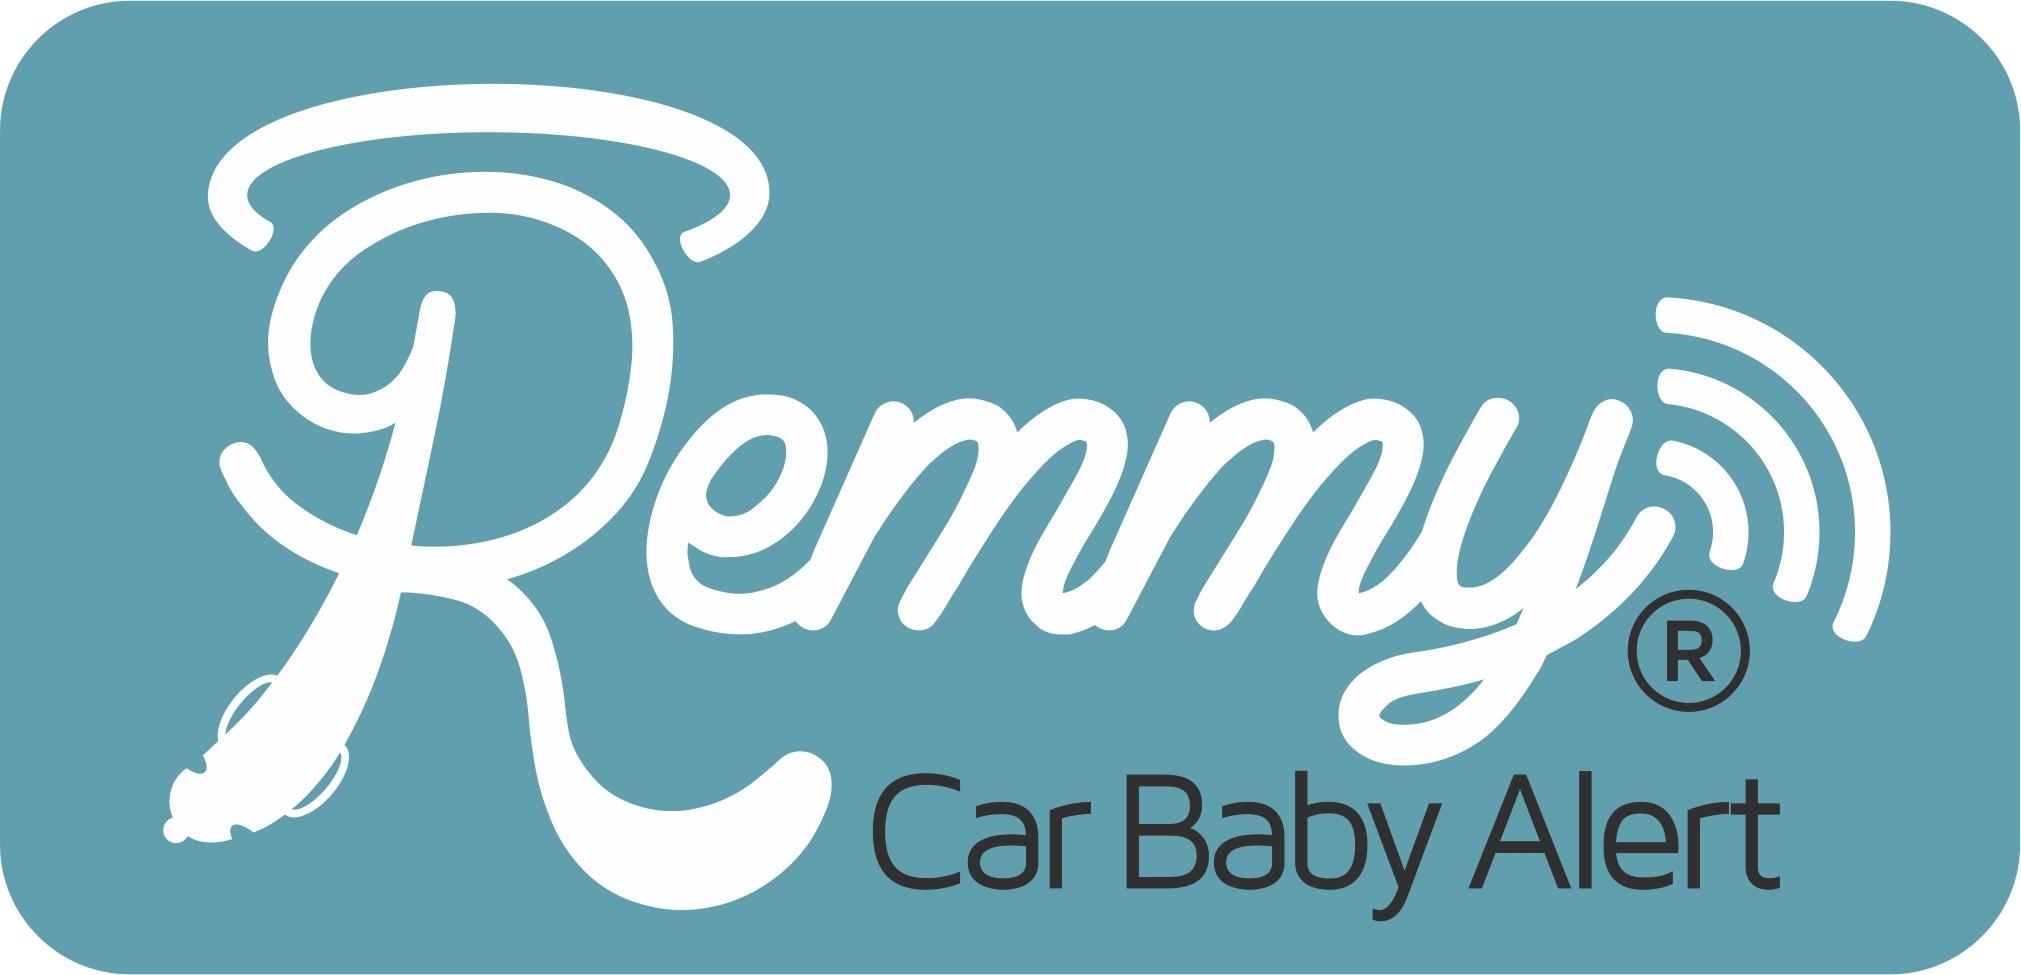 Remmy - CarBabyAlert